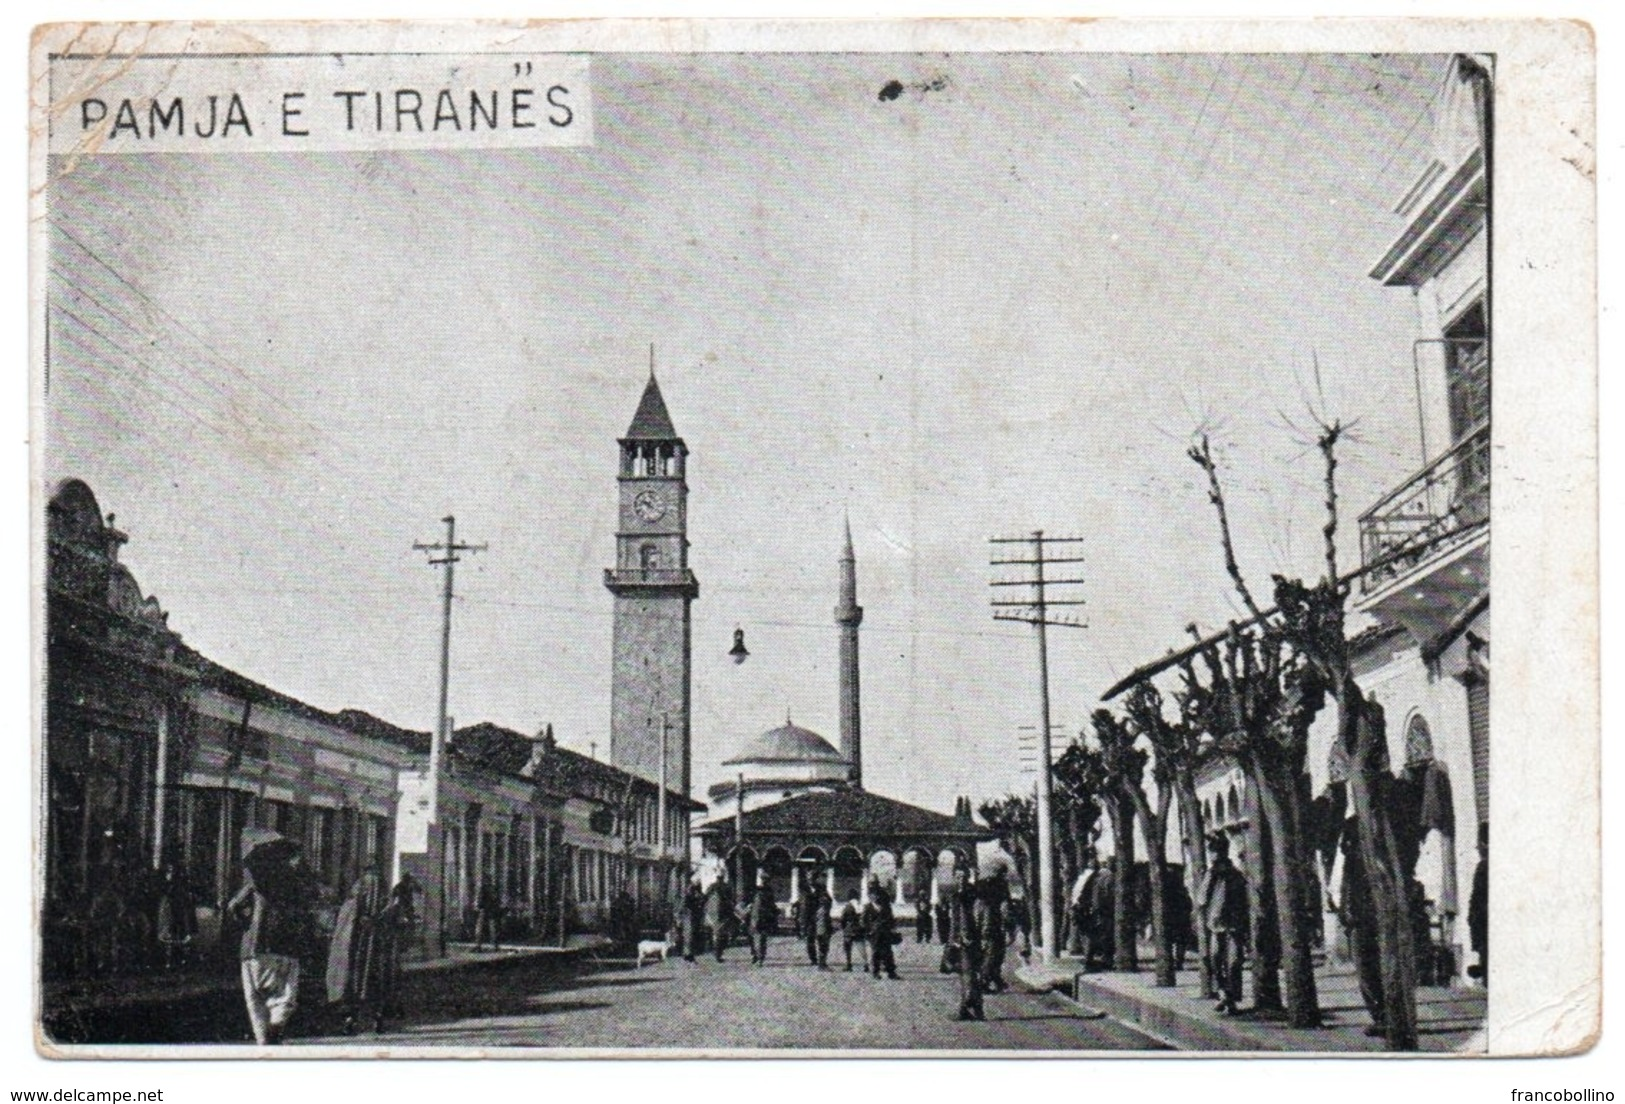 ALBANIE/ALBANIA - PAMJA E TIRANES / TIRANA / MOSQUE - Albania